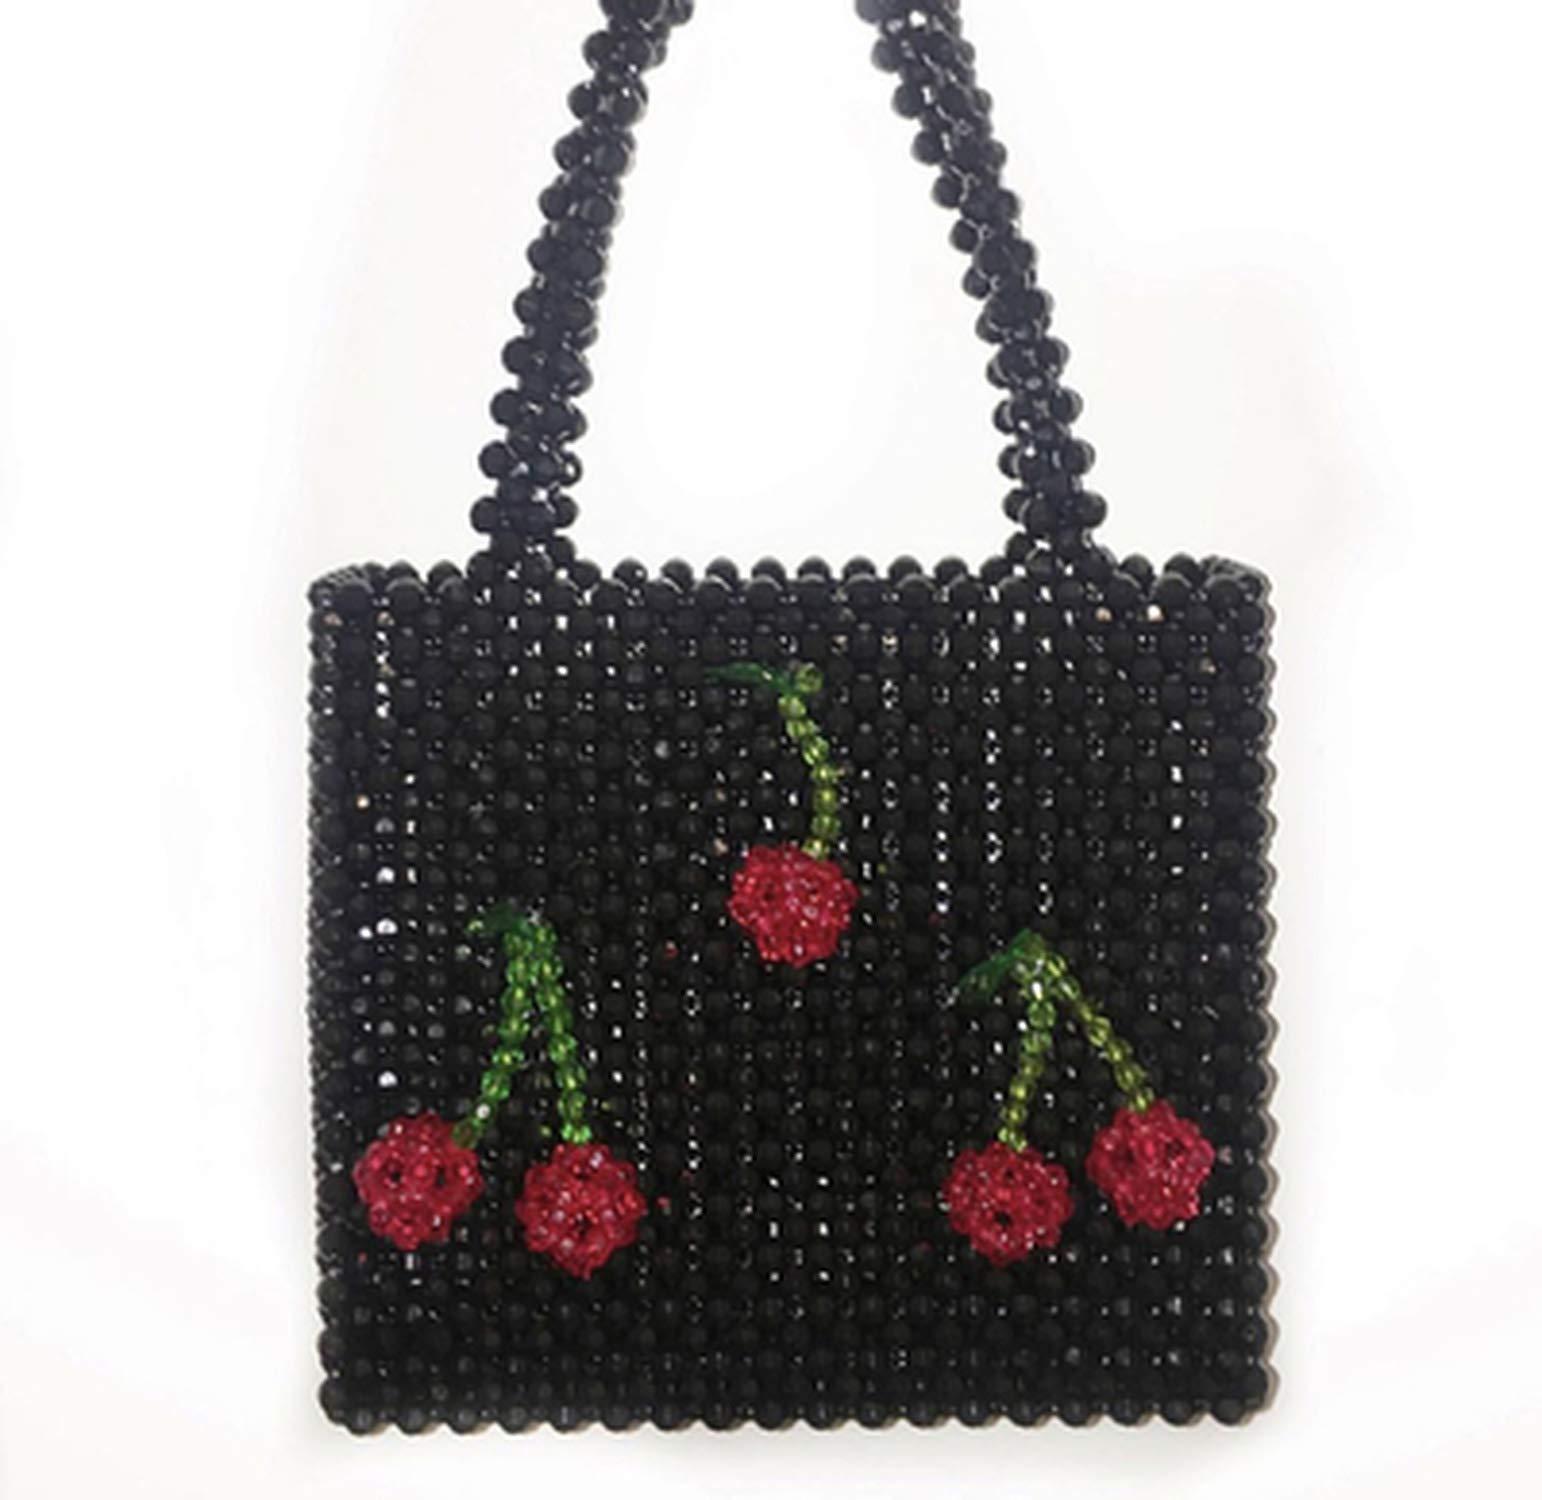 Pearls bag beaded cherry box totes bag women evening party handbag bags luxury brand,black pearl,20x20x7CM